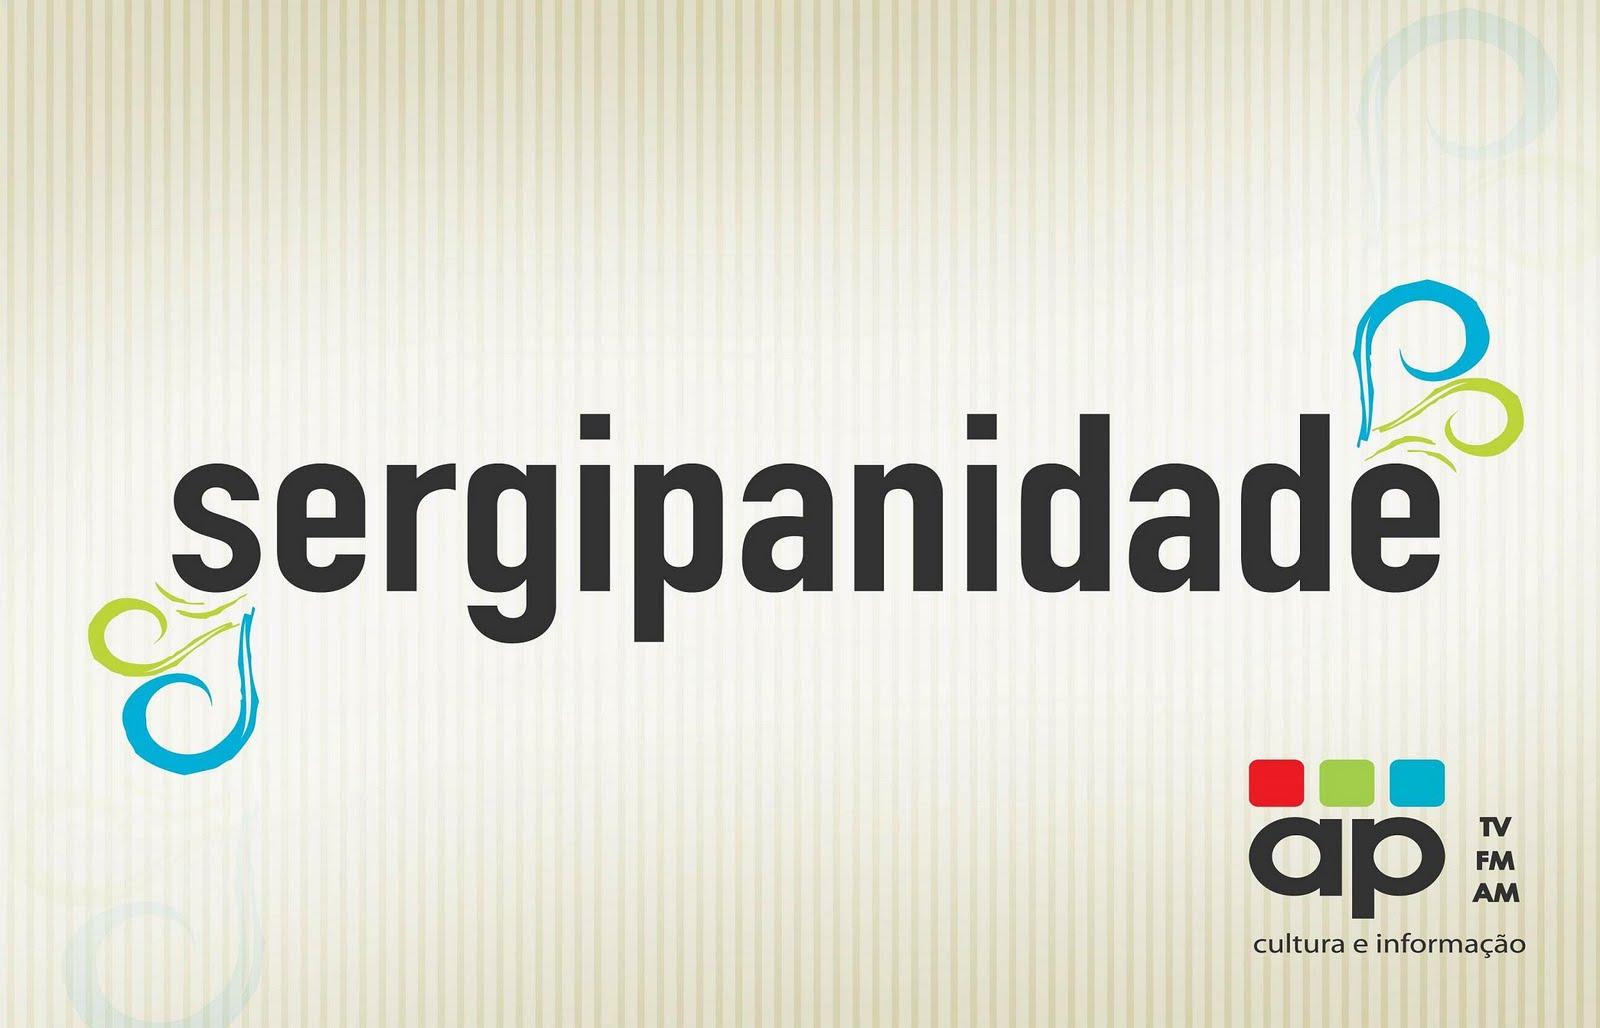 Projeto Sergipanidade